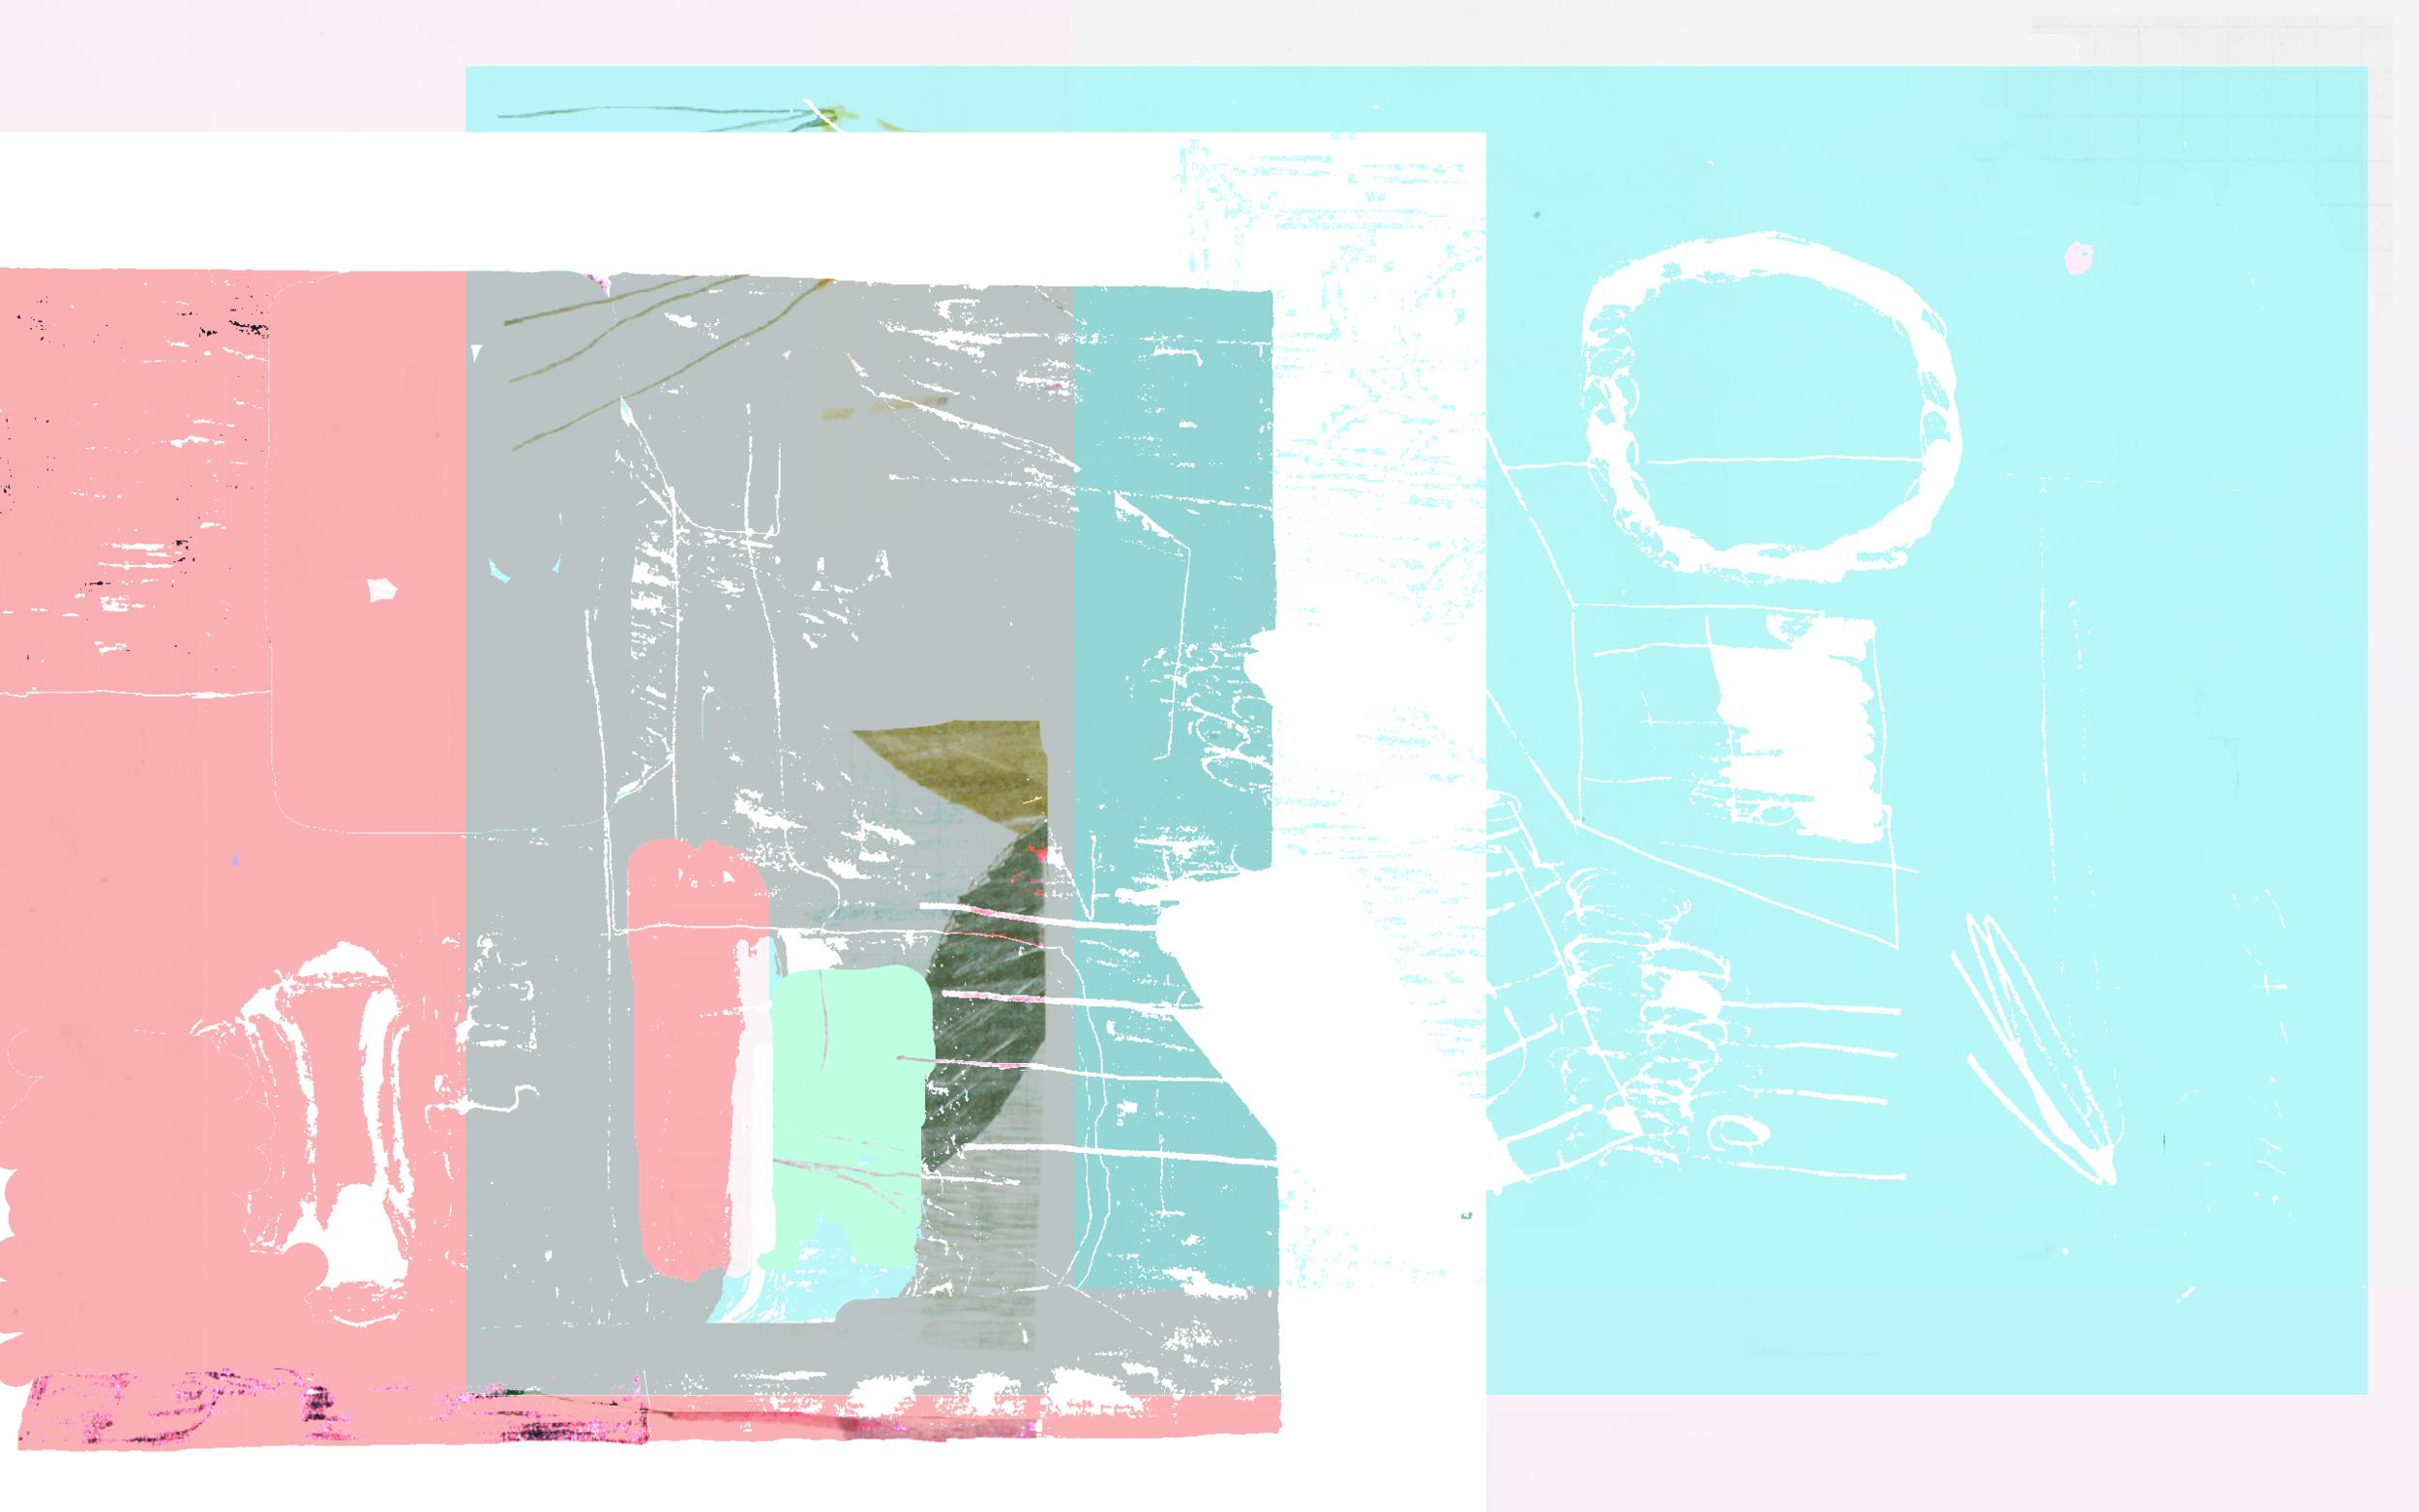 artflow_201701301935.png